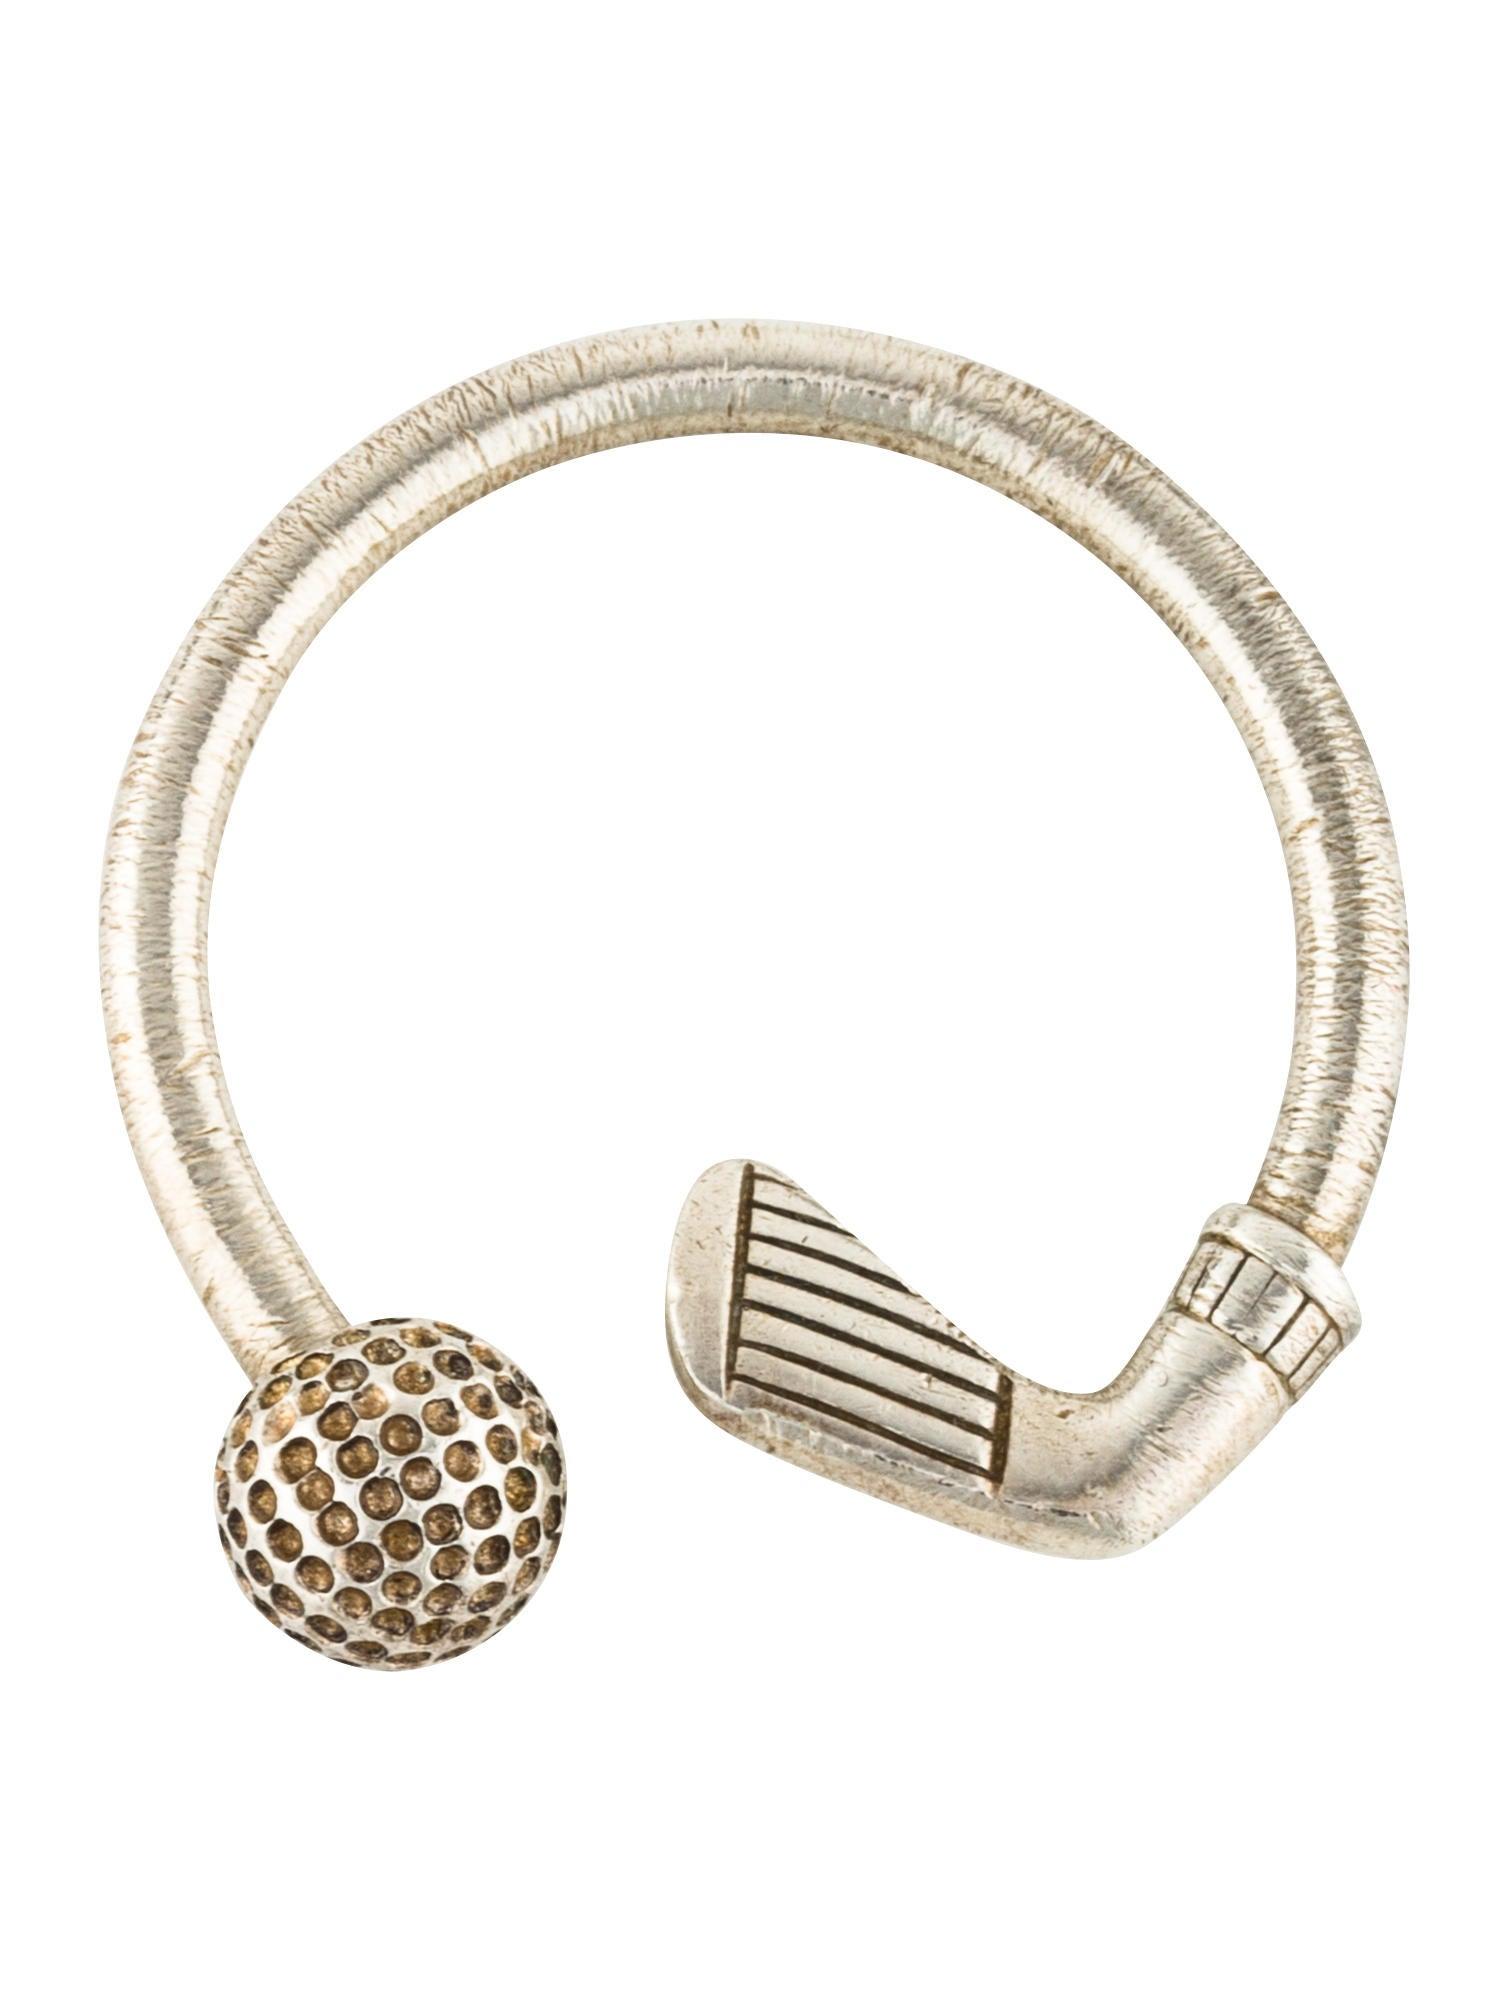 6654712ca Tiffany & Co. Golf Ball Key Ring - Accessories - TIF69477 | The RealReal